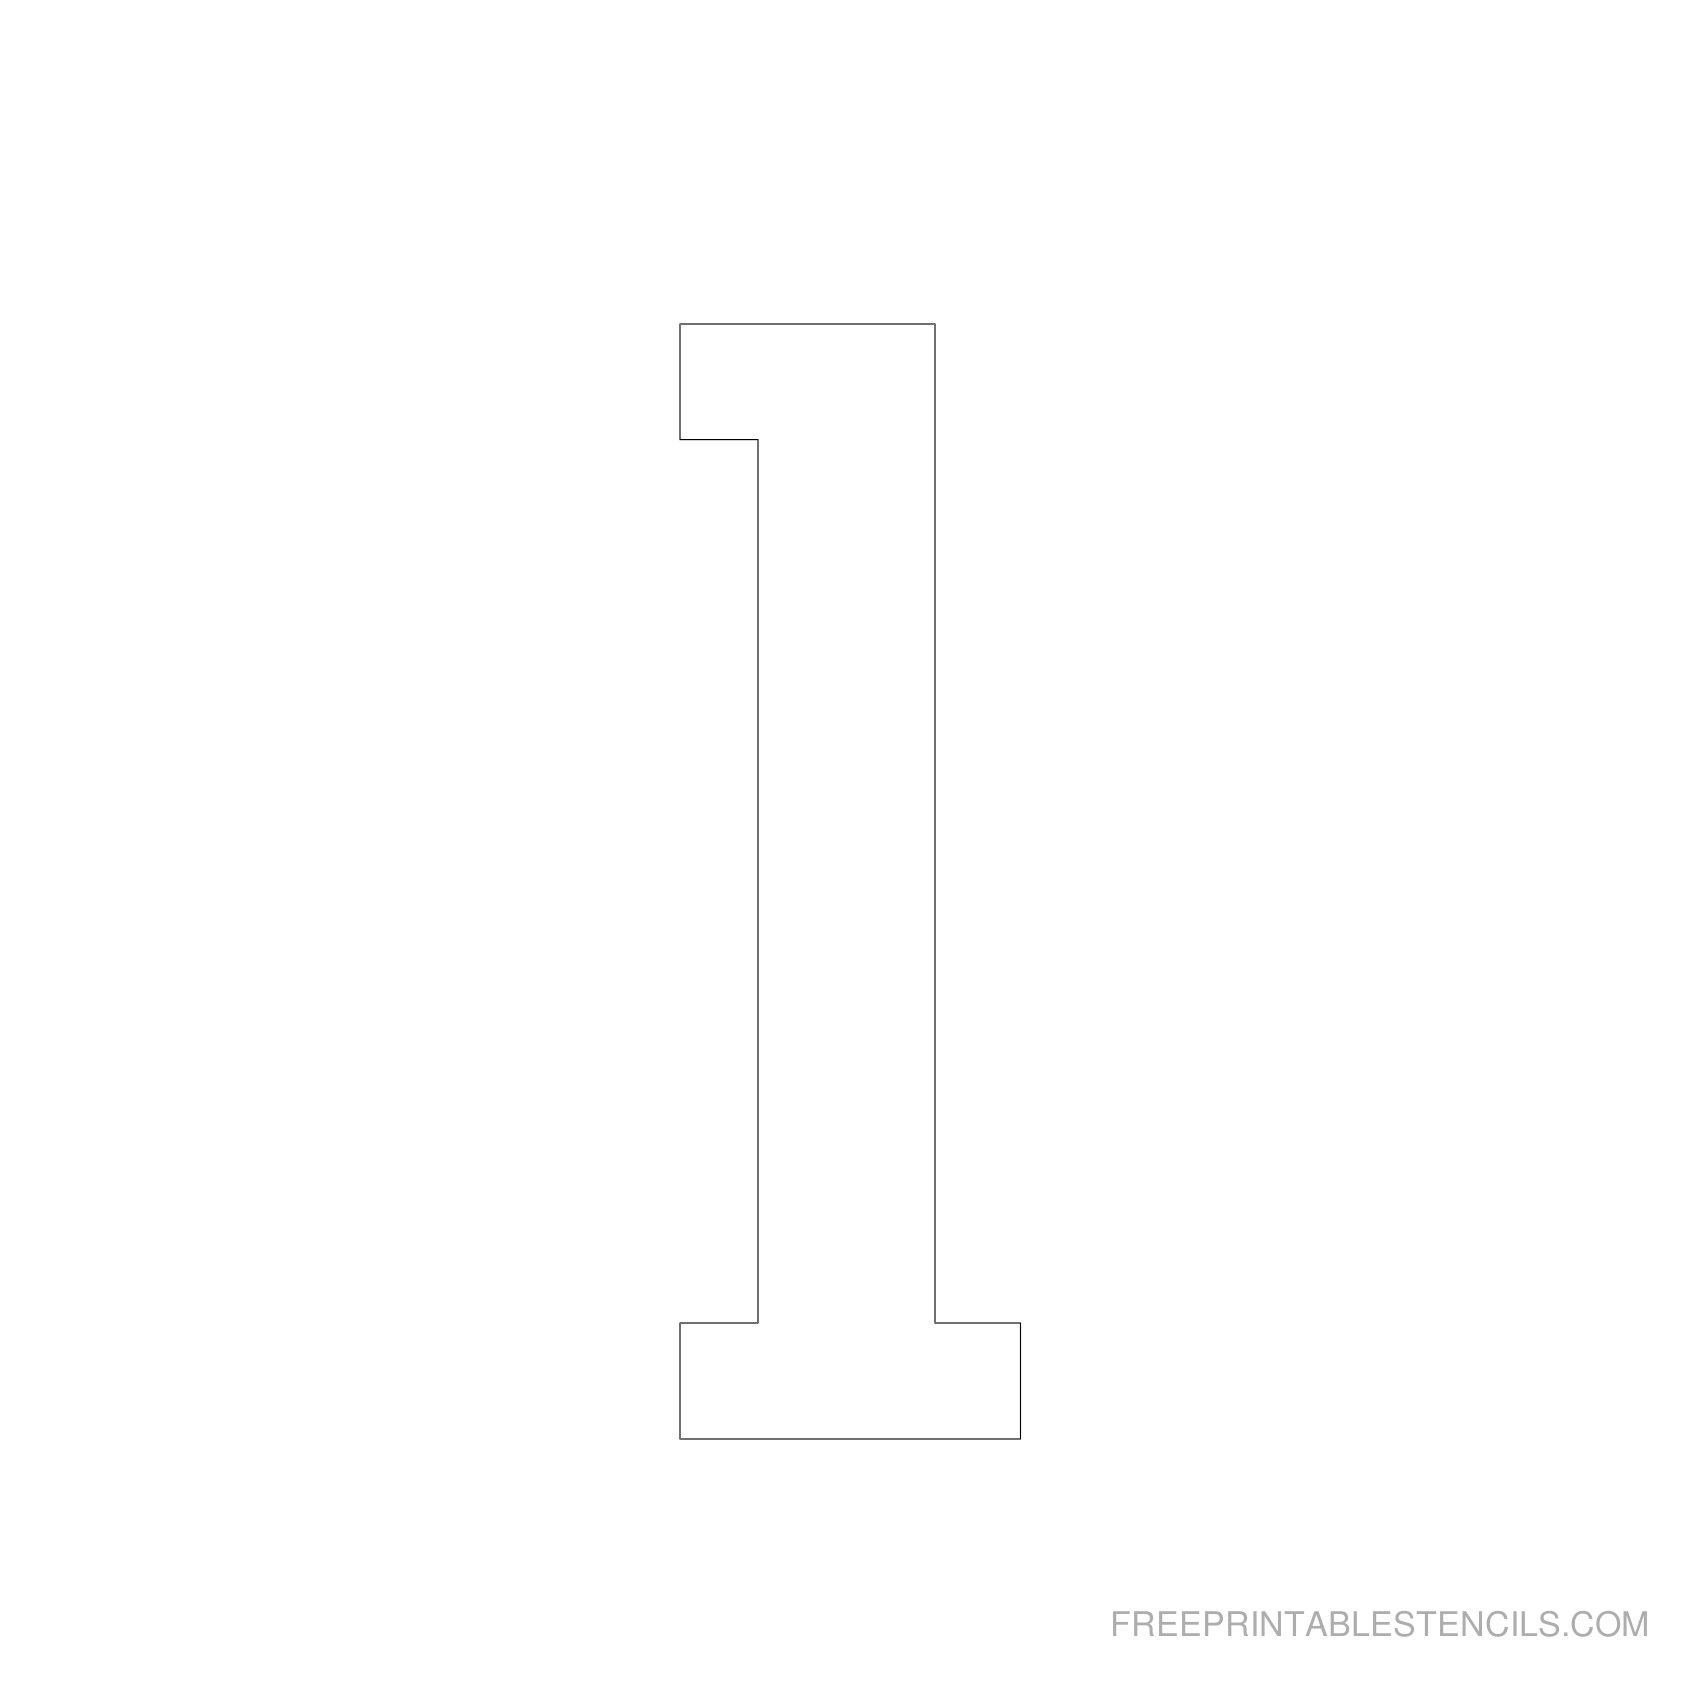 Printable 5 Inch Number Stencils 1-10 | Free Printable Stencils - Free Printable 5 Inch Number Stencils